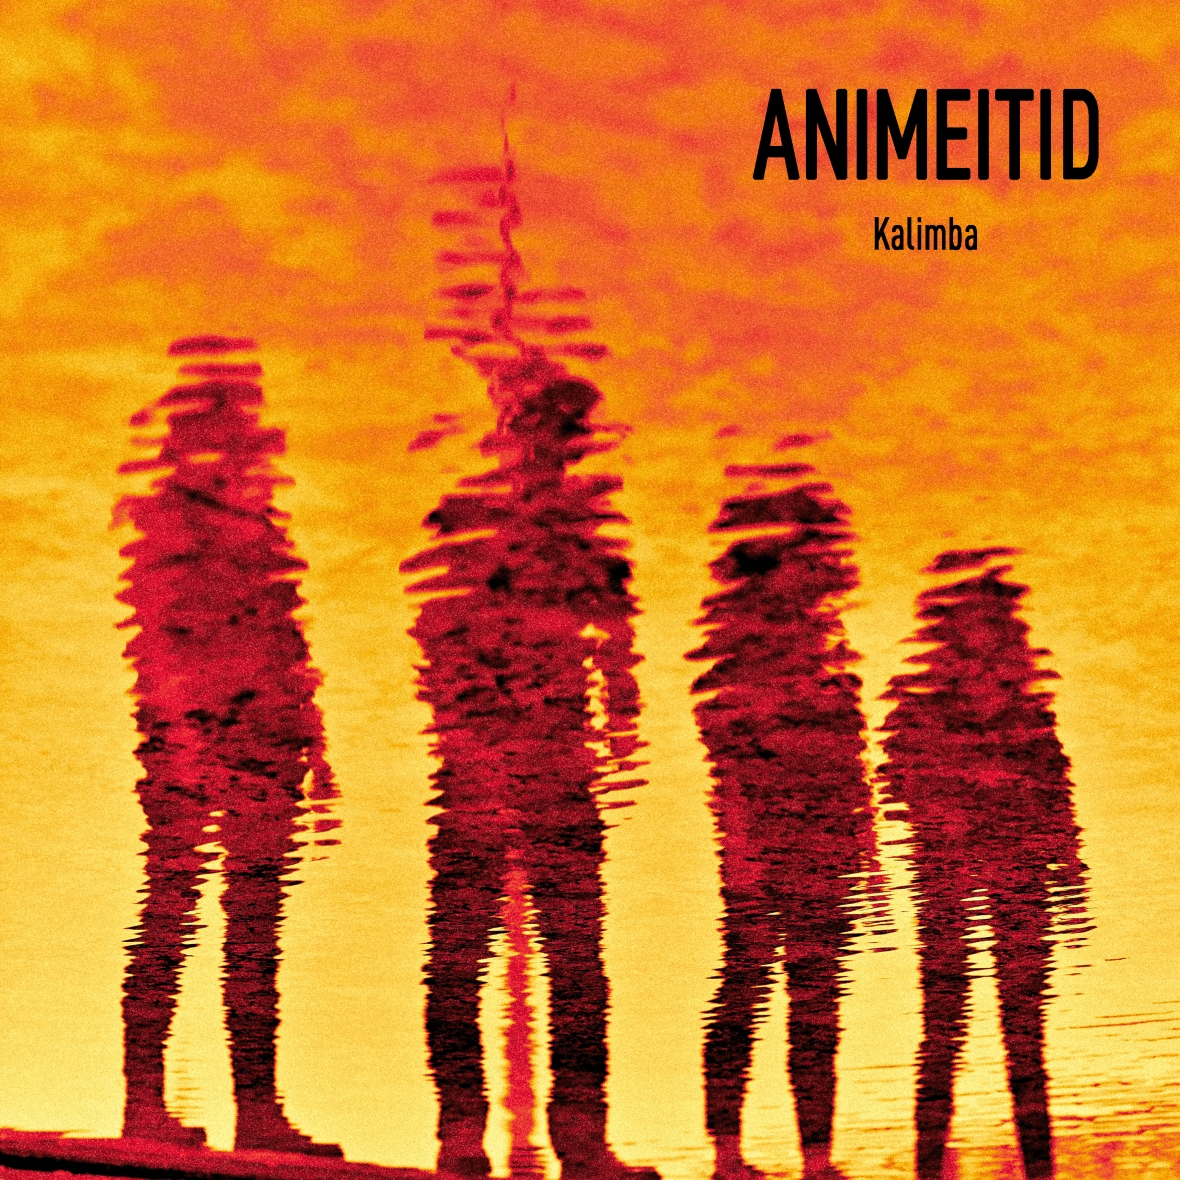 ANIMEITID - Kalimba (Clip Officiel)